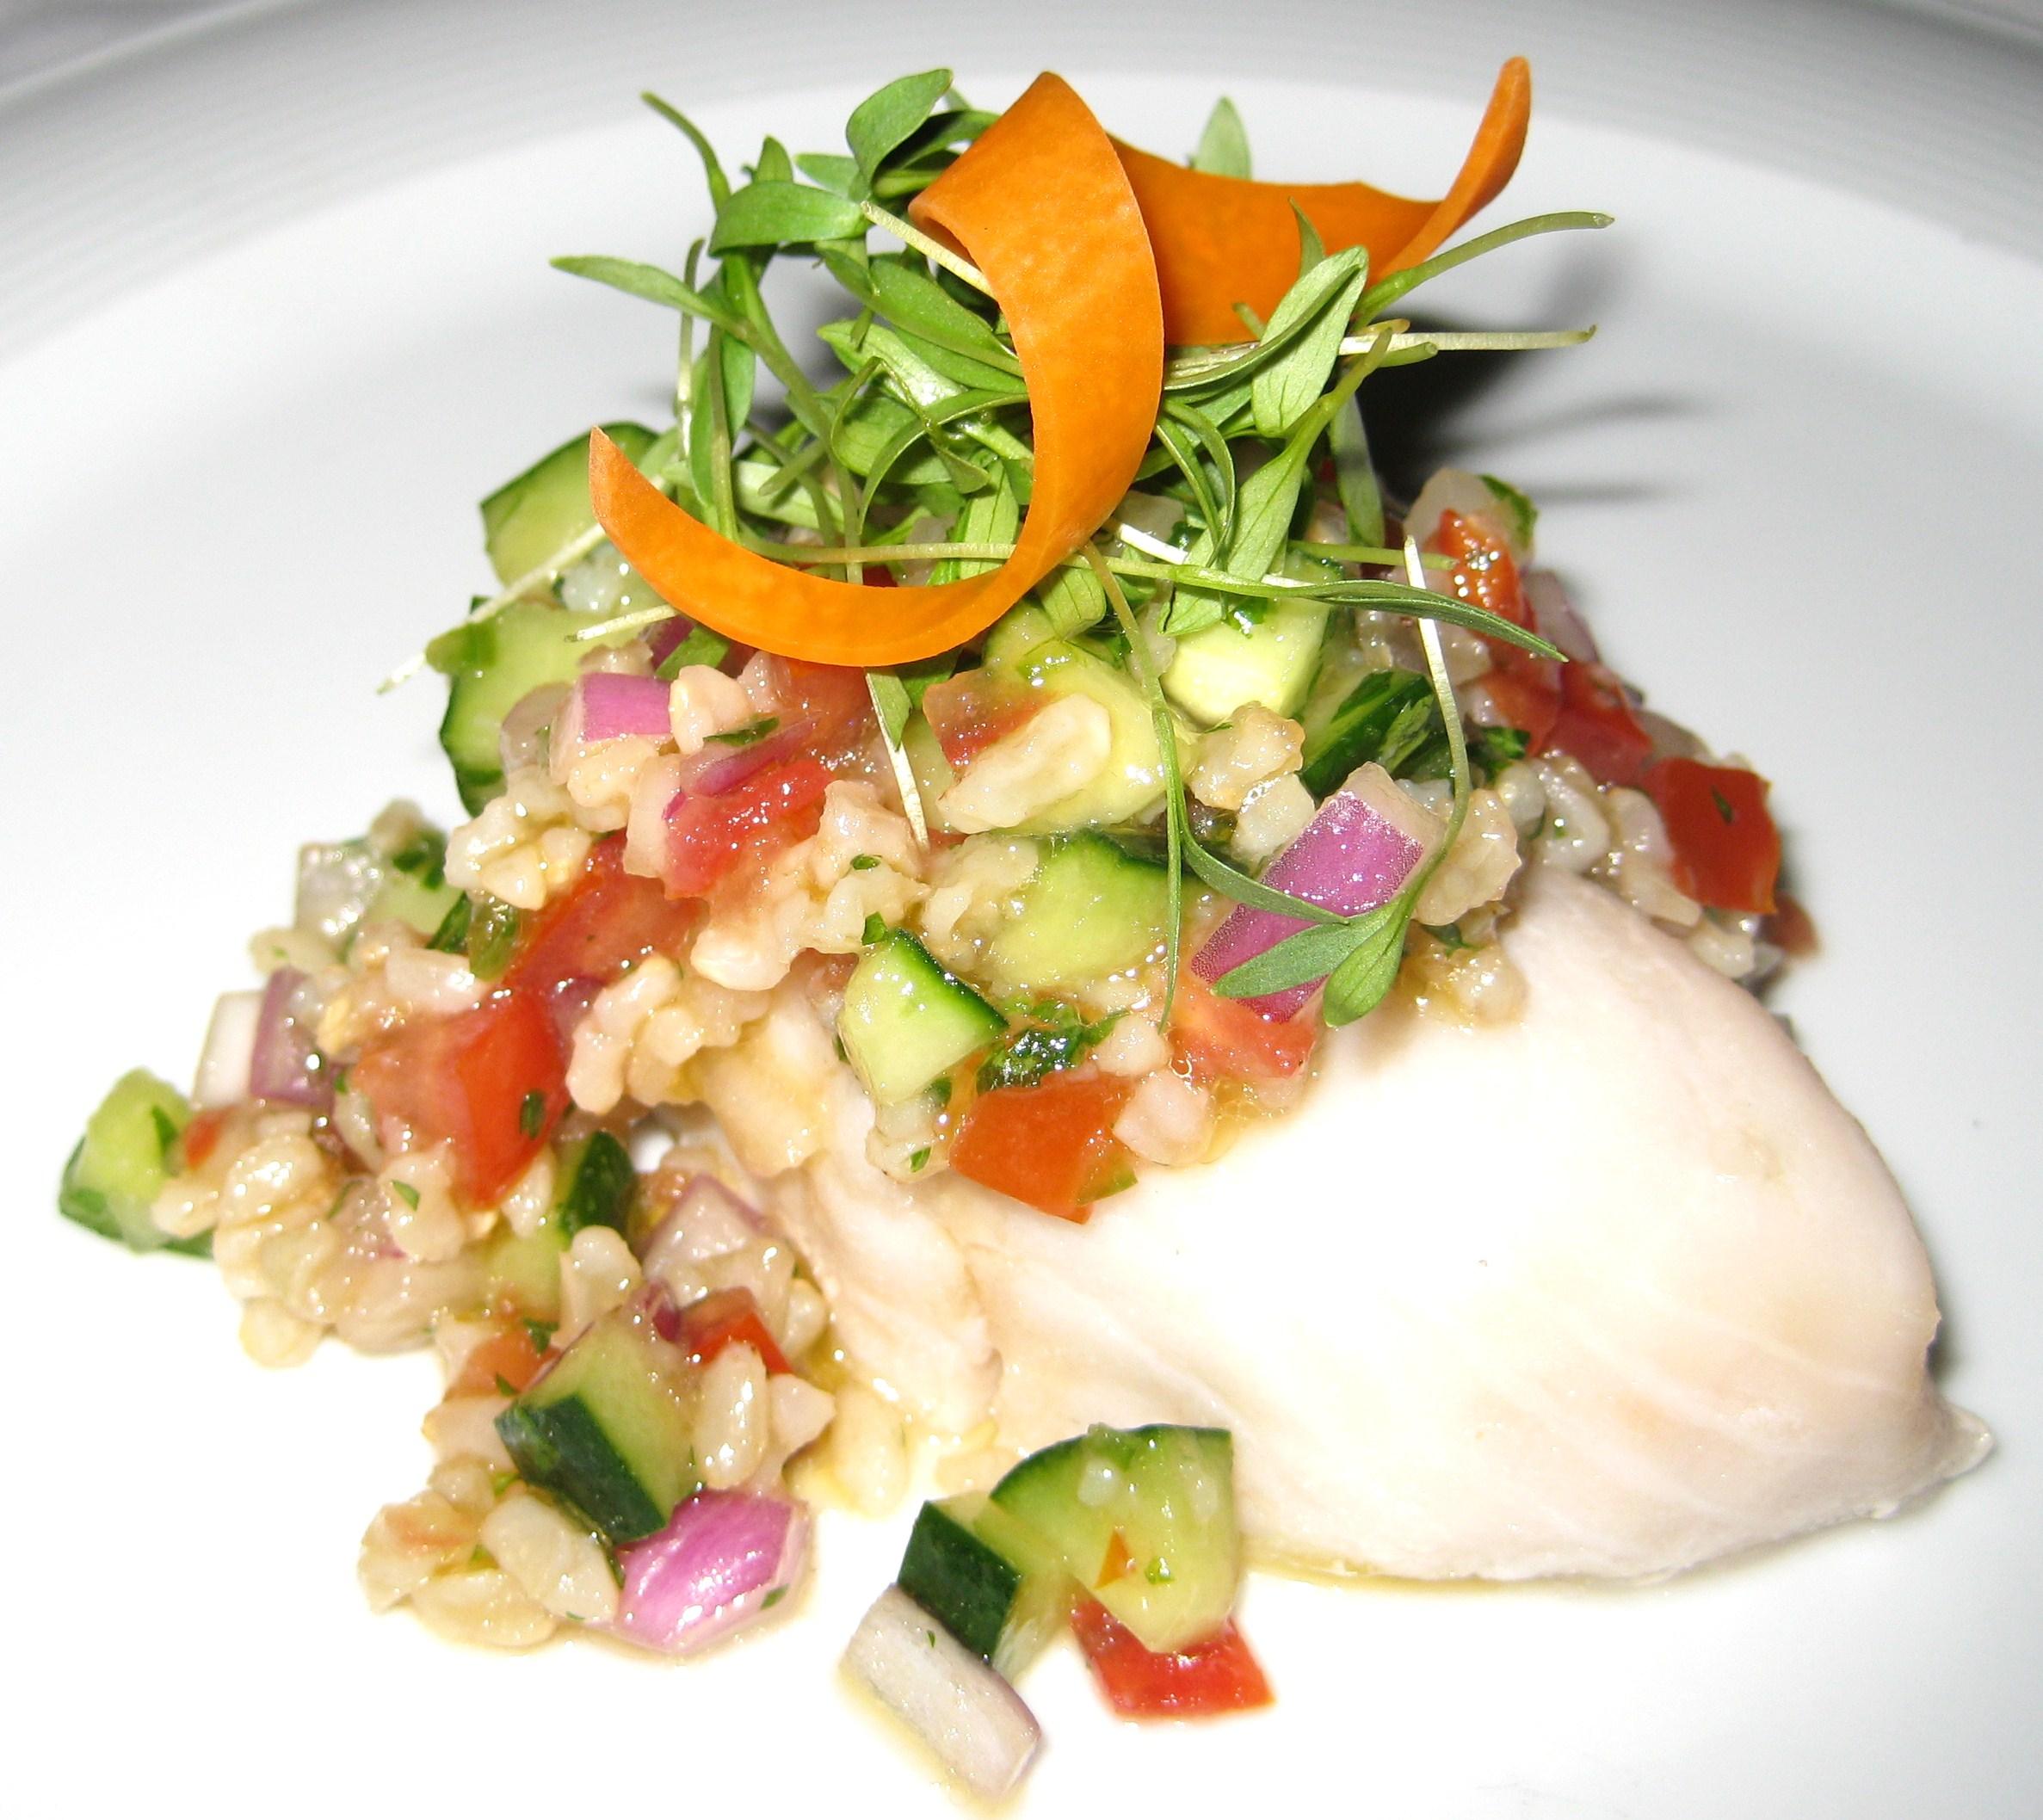 Chef Nobu Matsuhisa's black cod